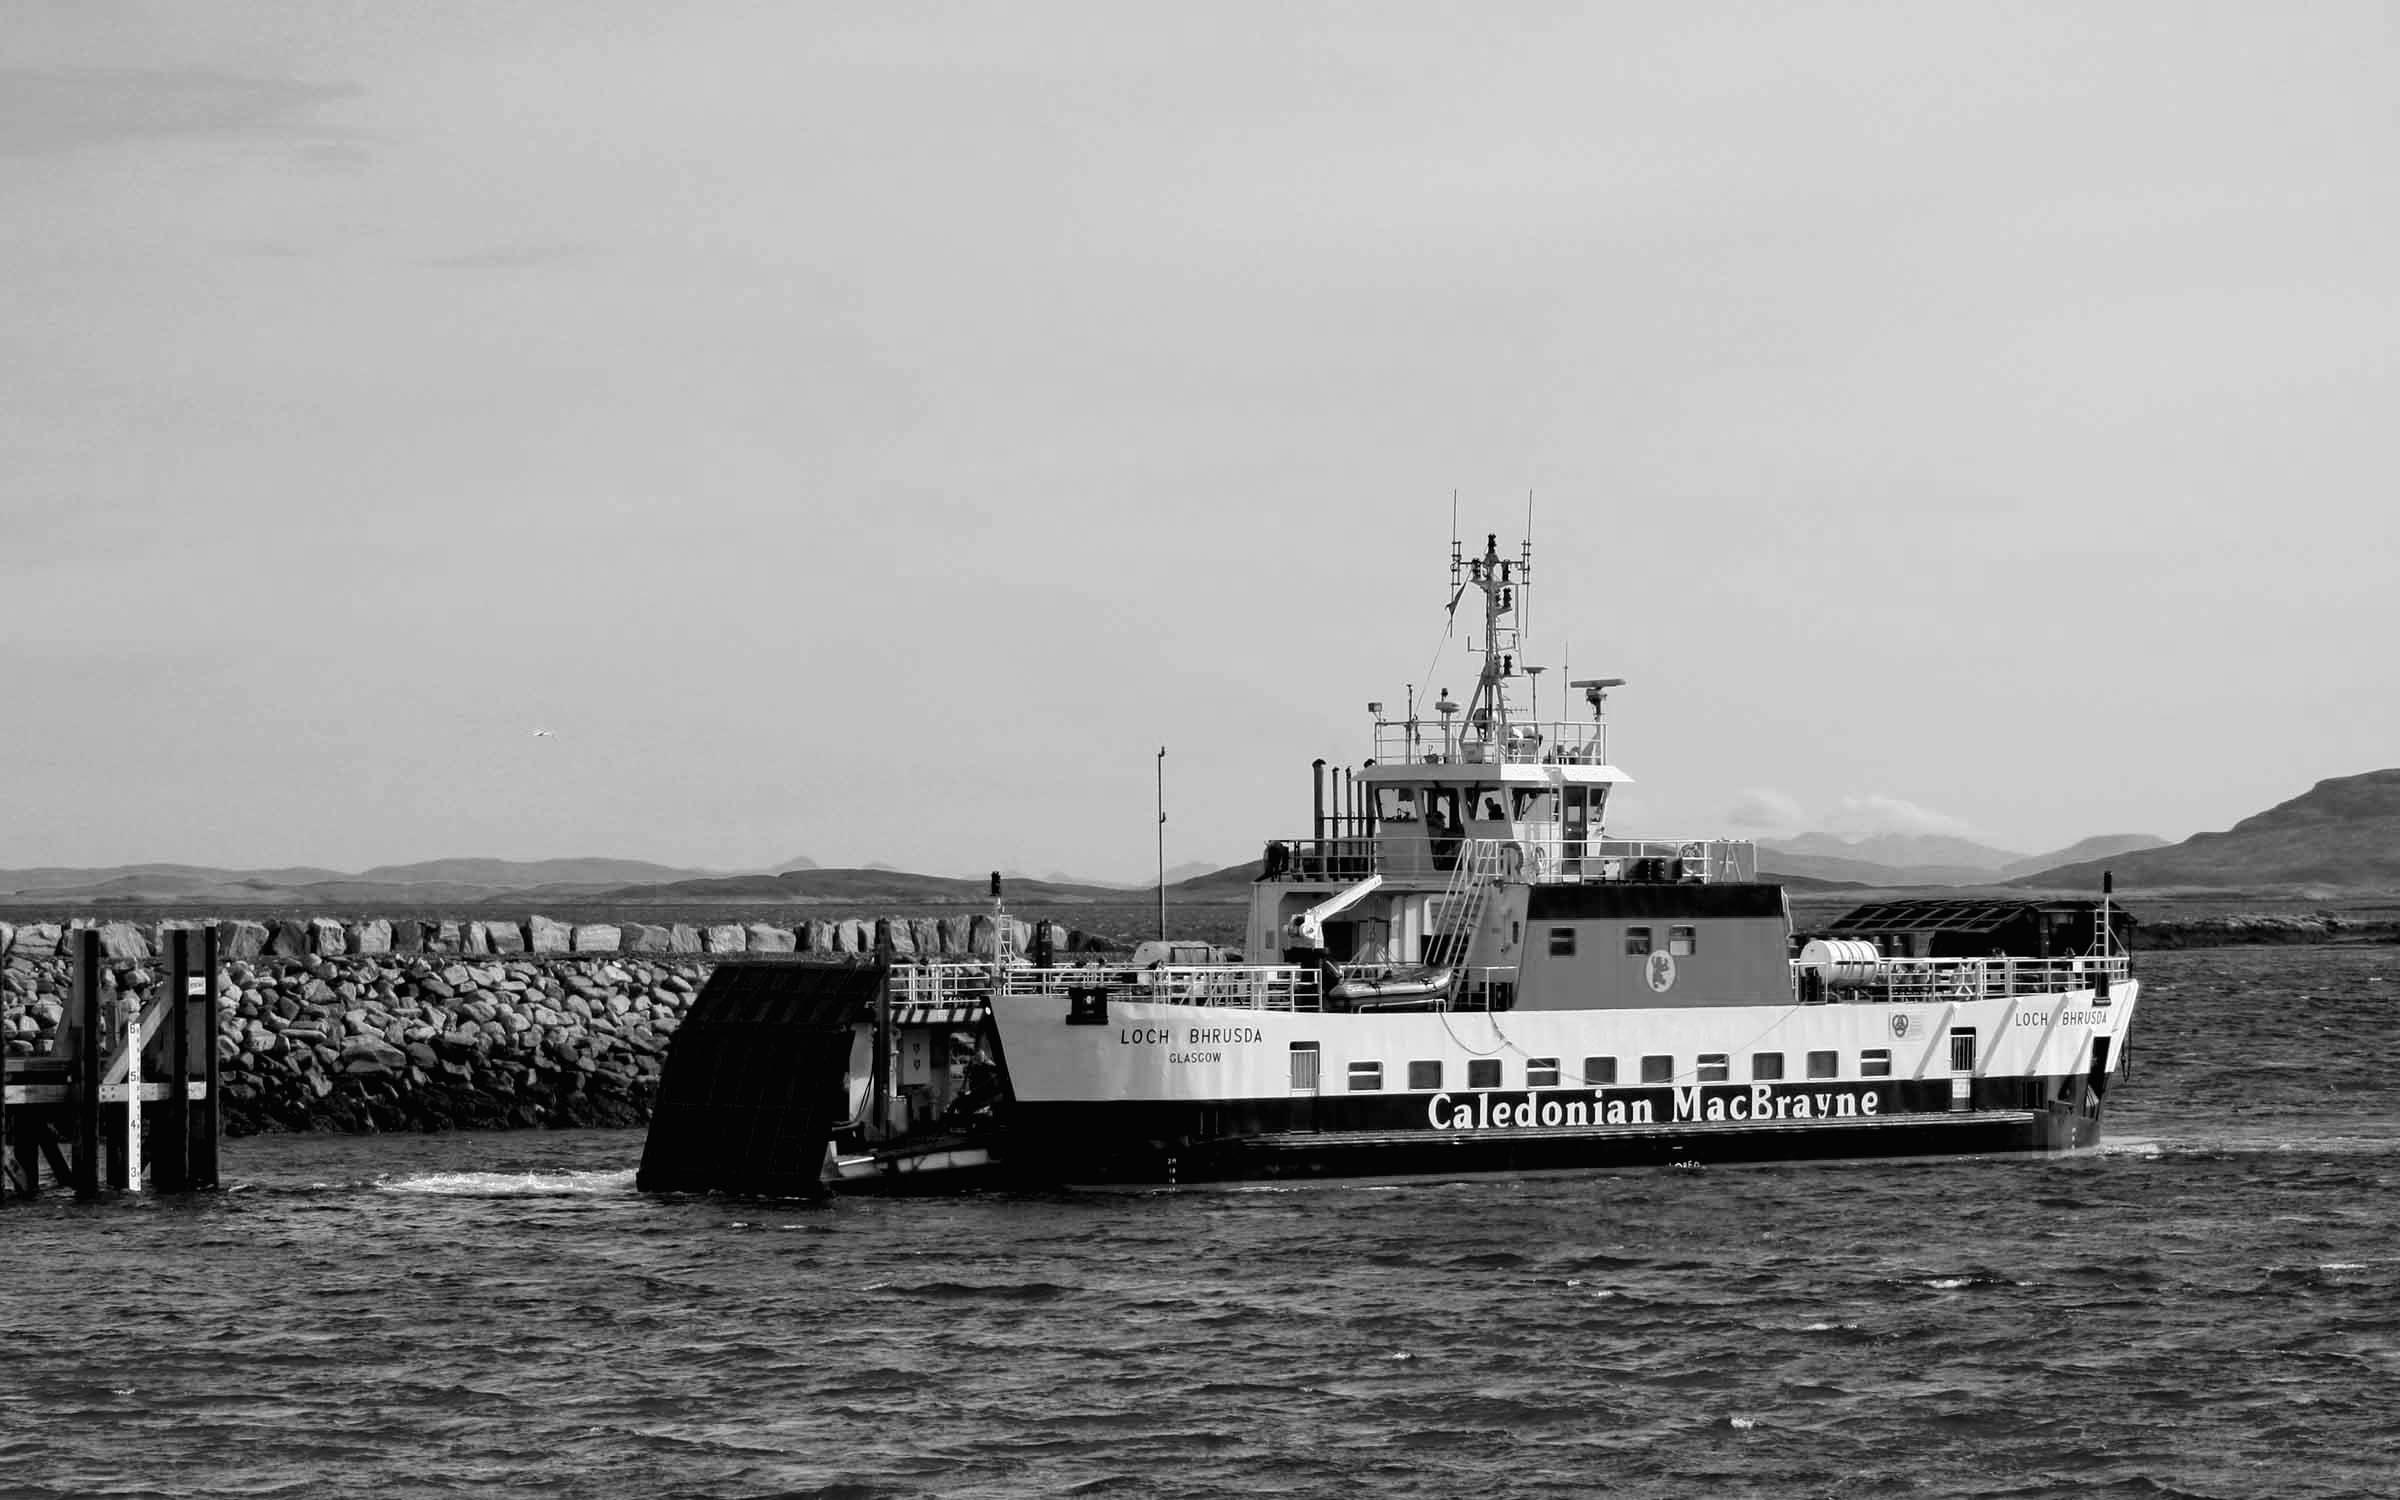 Loch Bhrusda arriving at Berneray (Ships of CalMac)